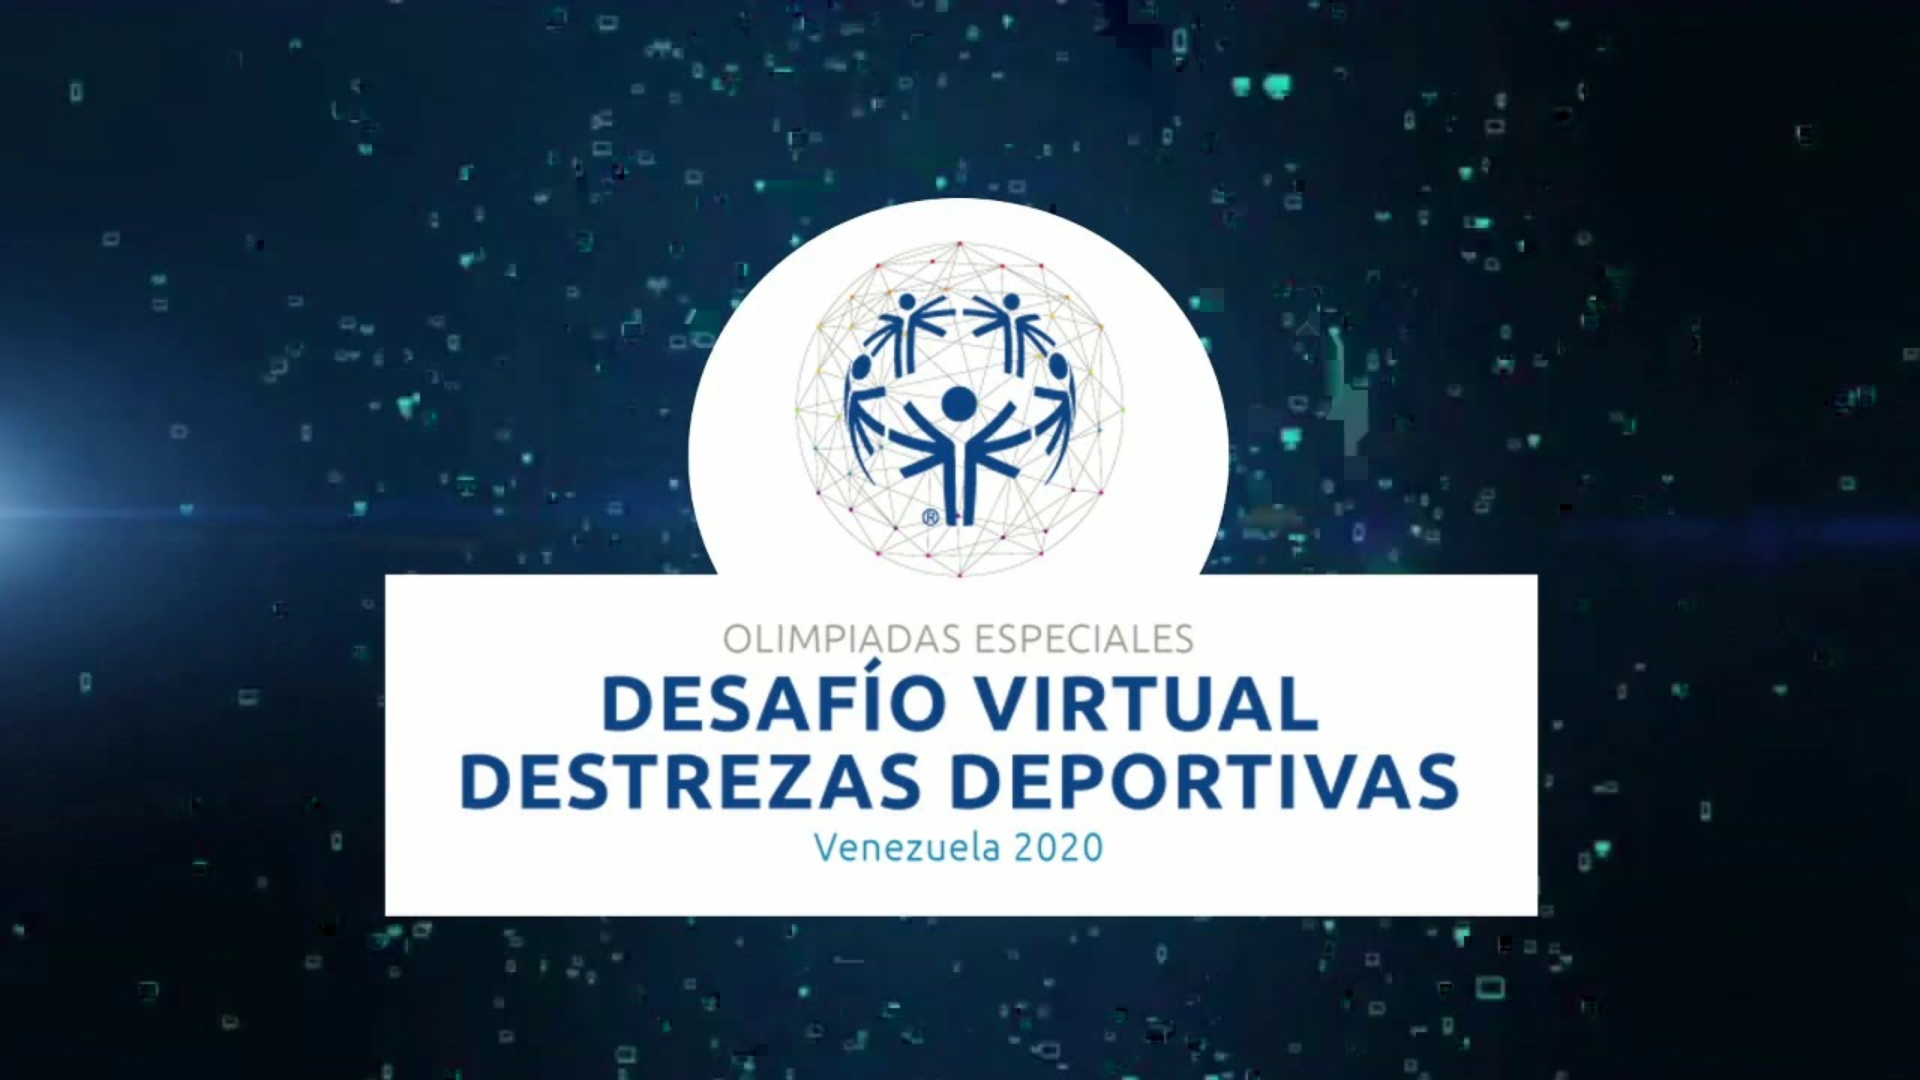 Desafio-Virtual-Destrezas-Deportivas